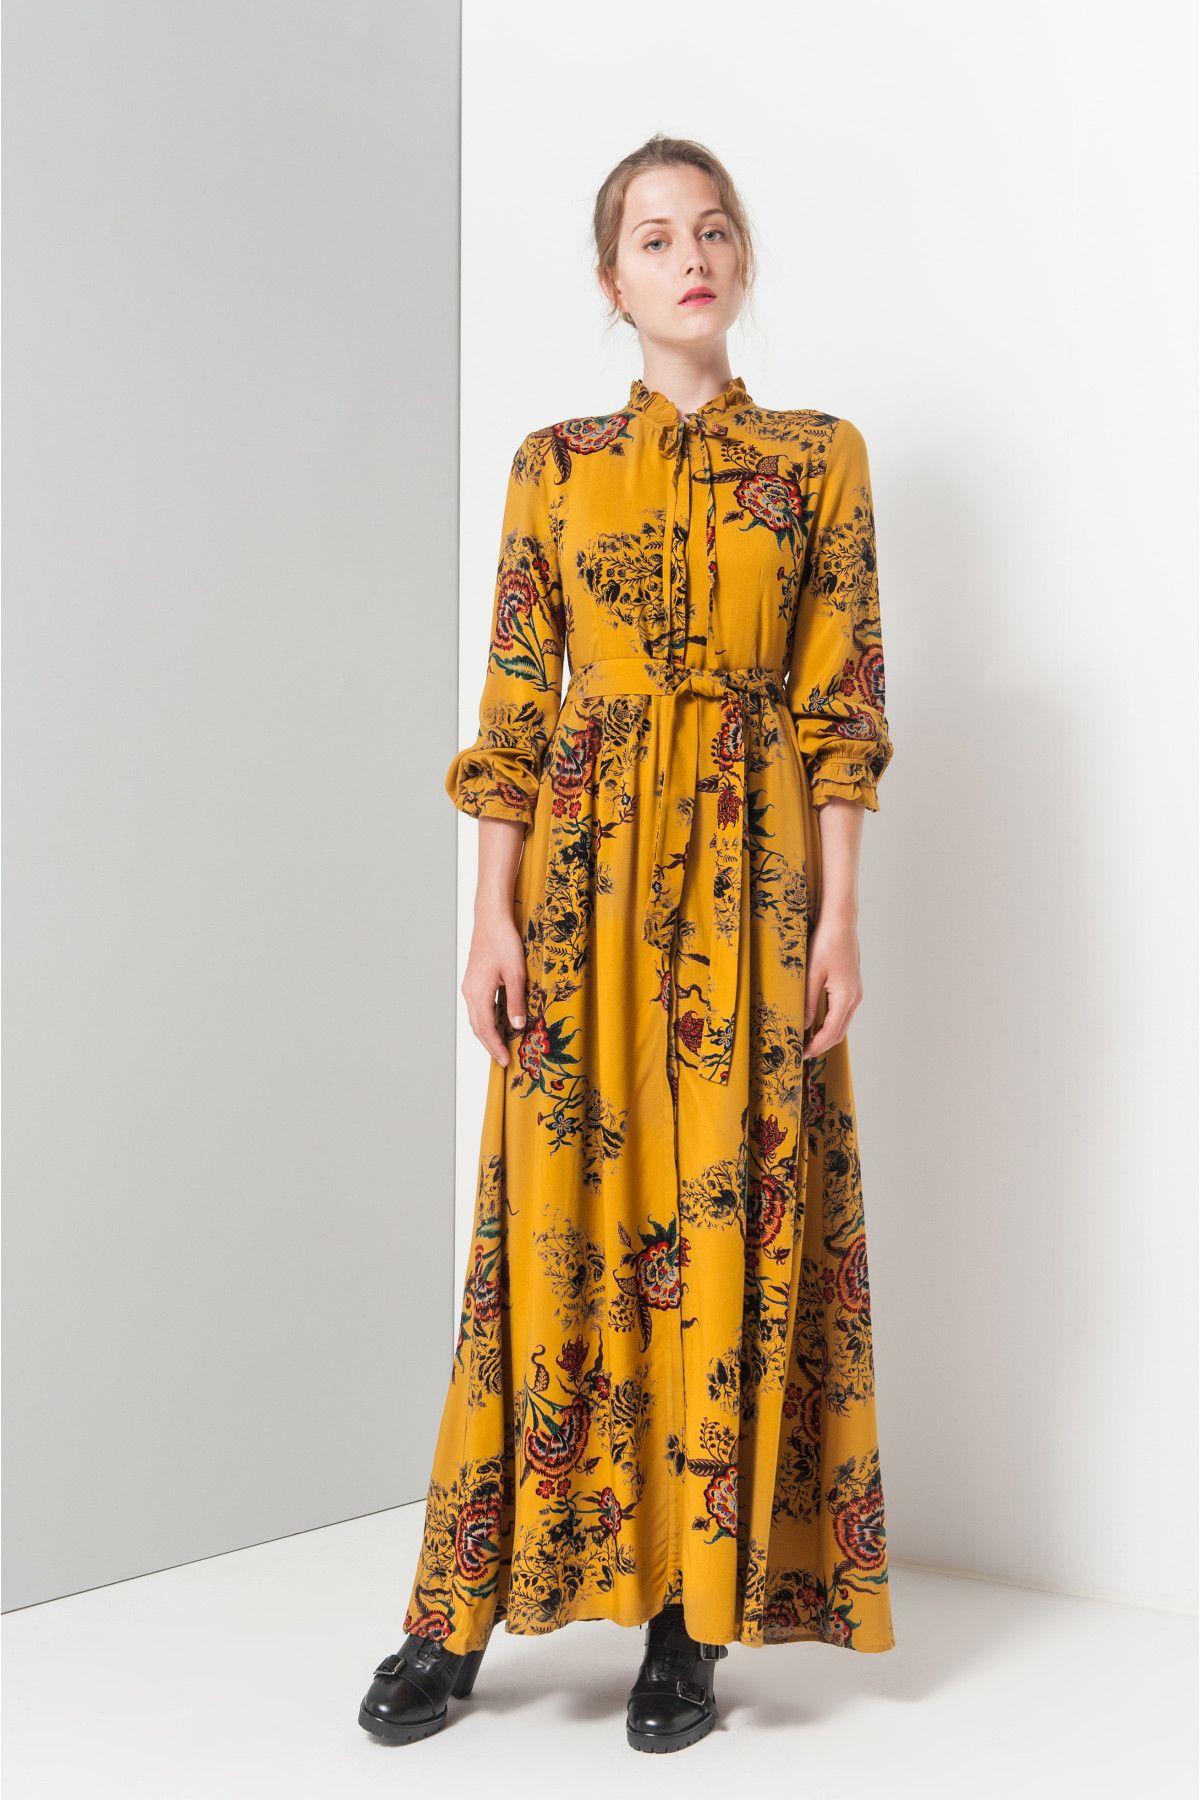 61c37d438bae Φορεμα κρουαζε midi